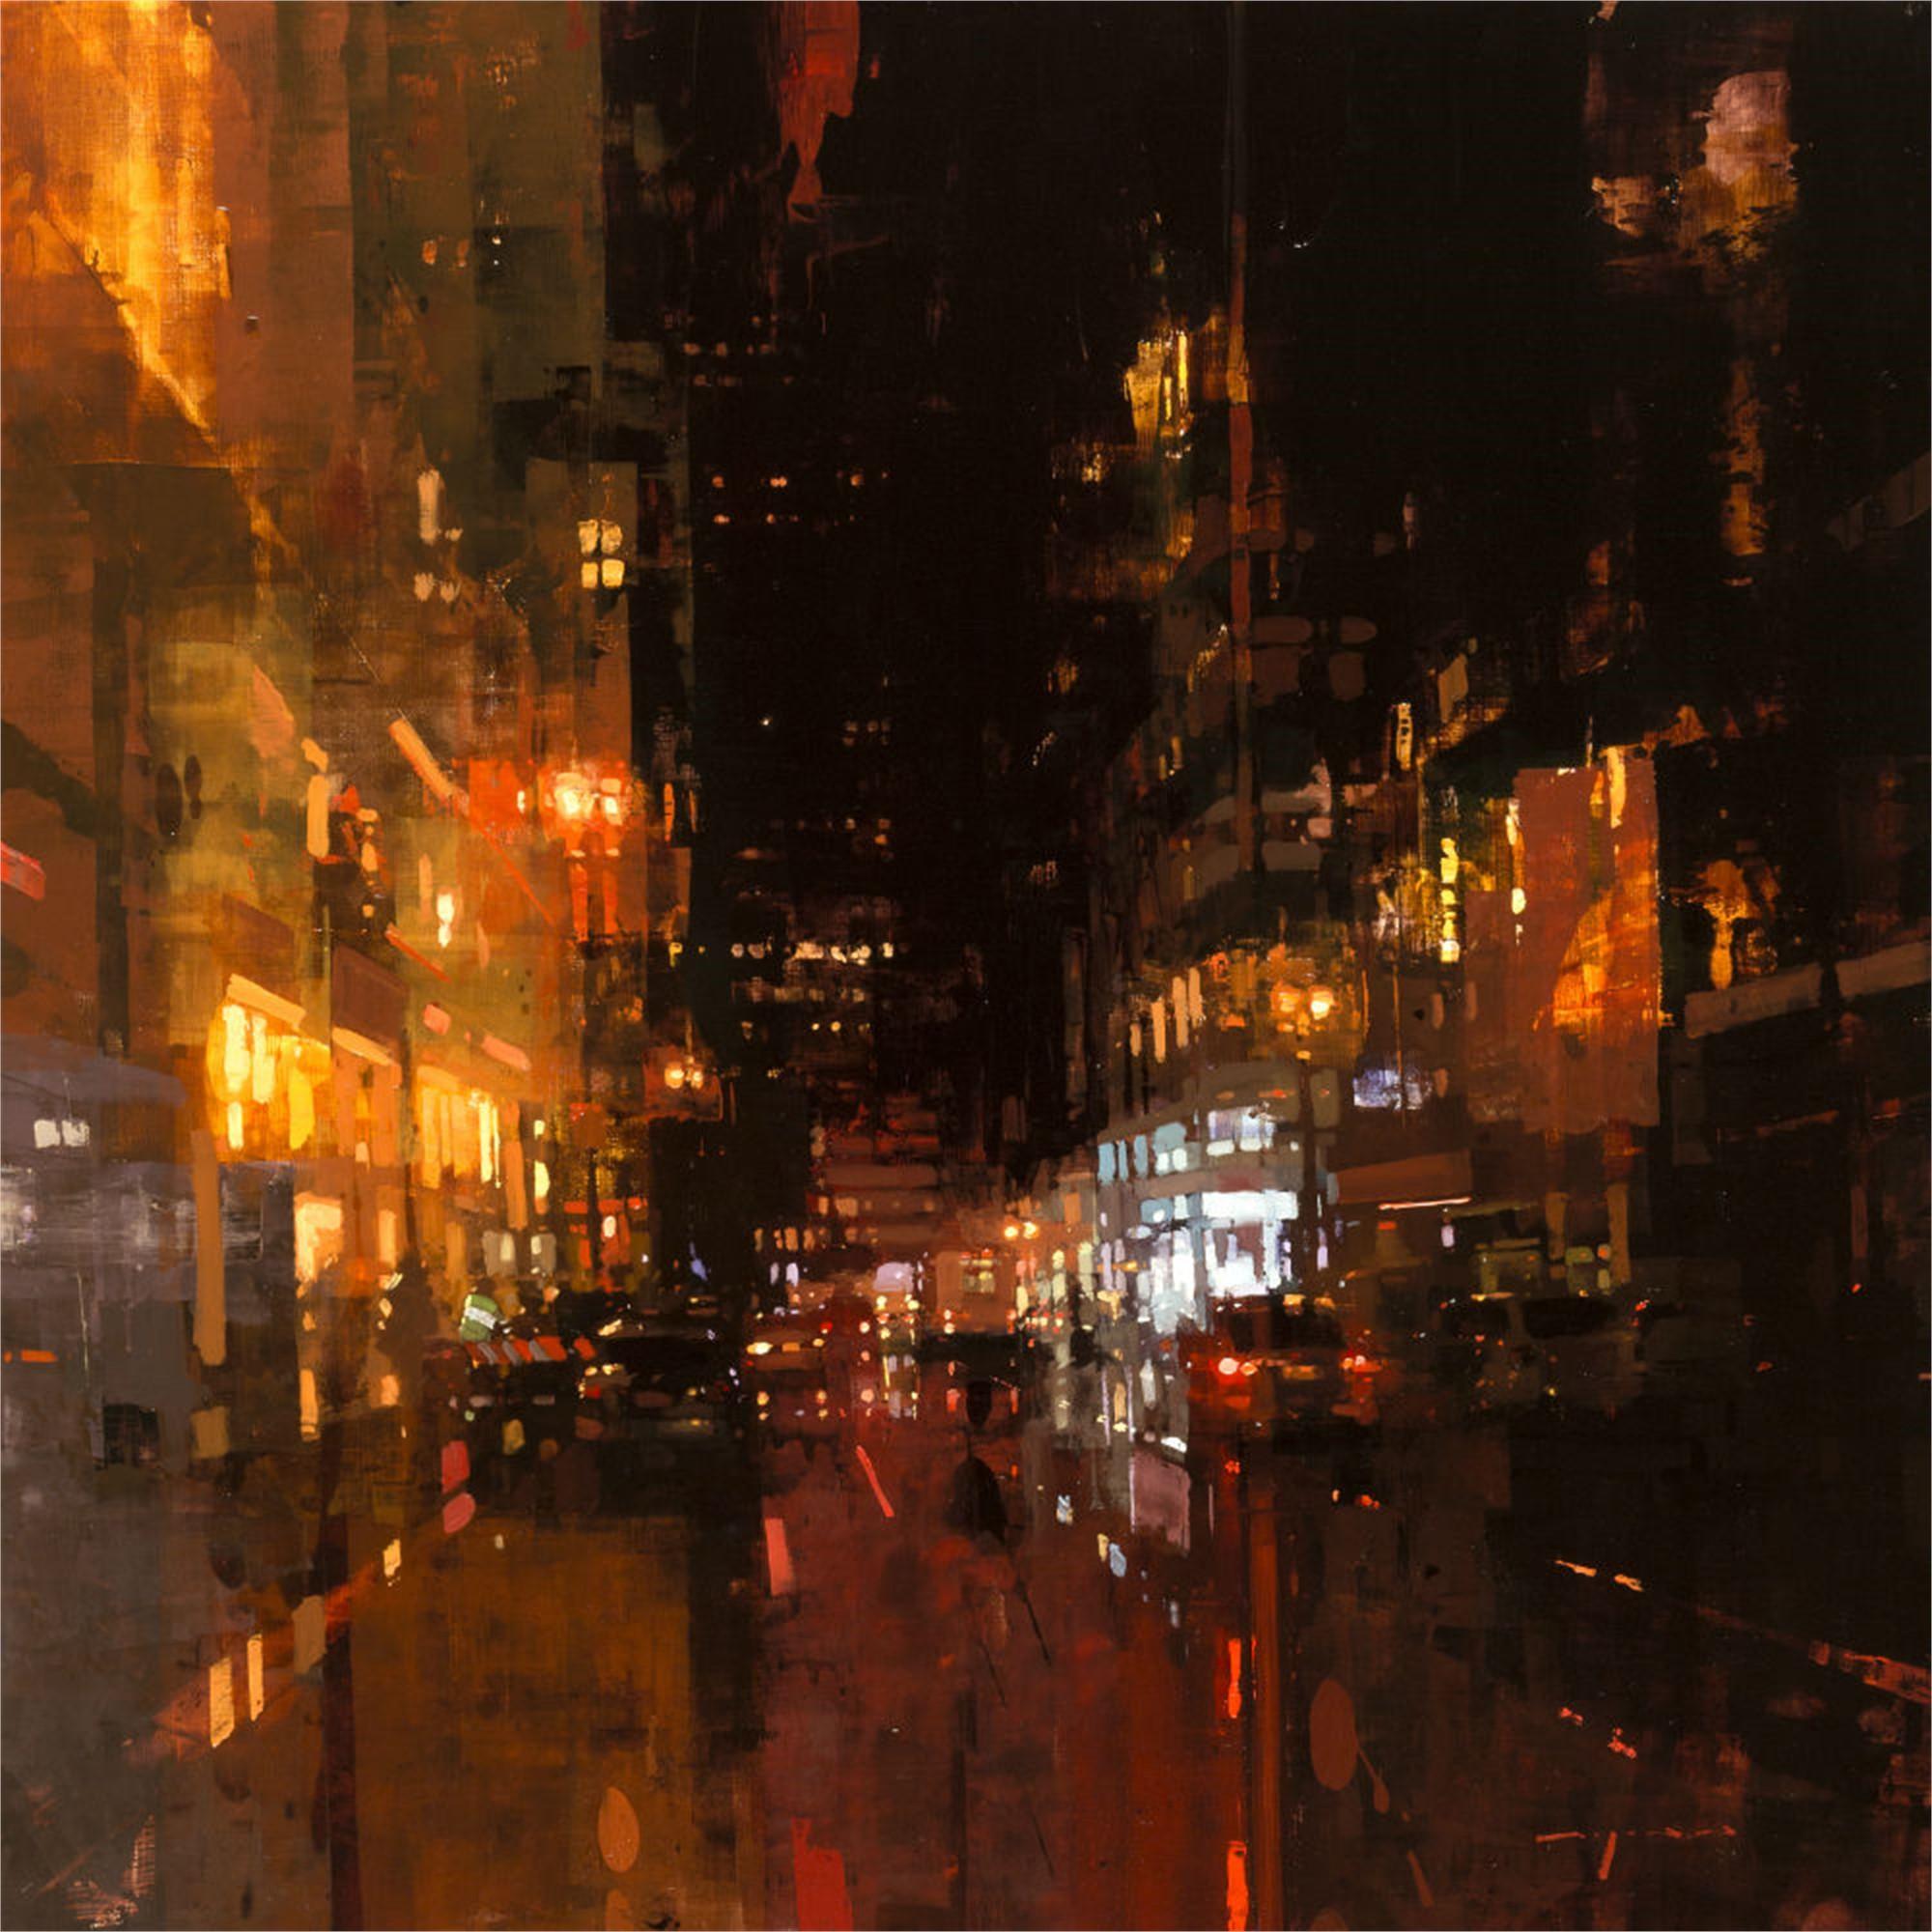 SF Night in Red by Jeremy Mann